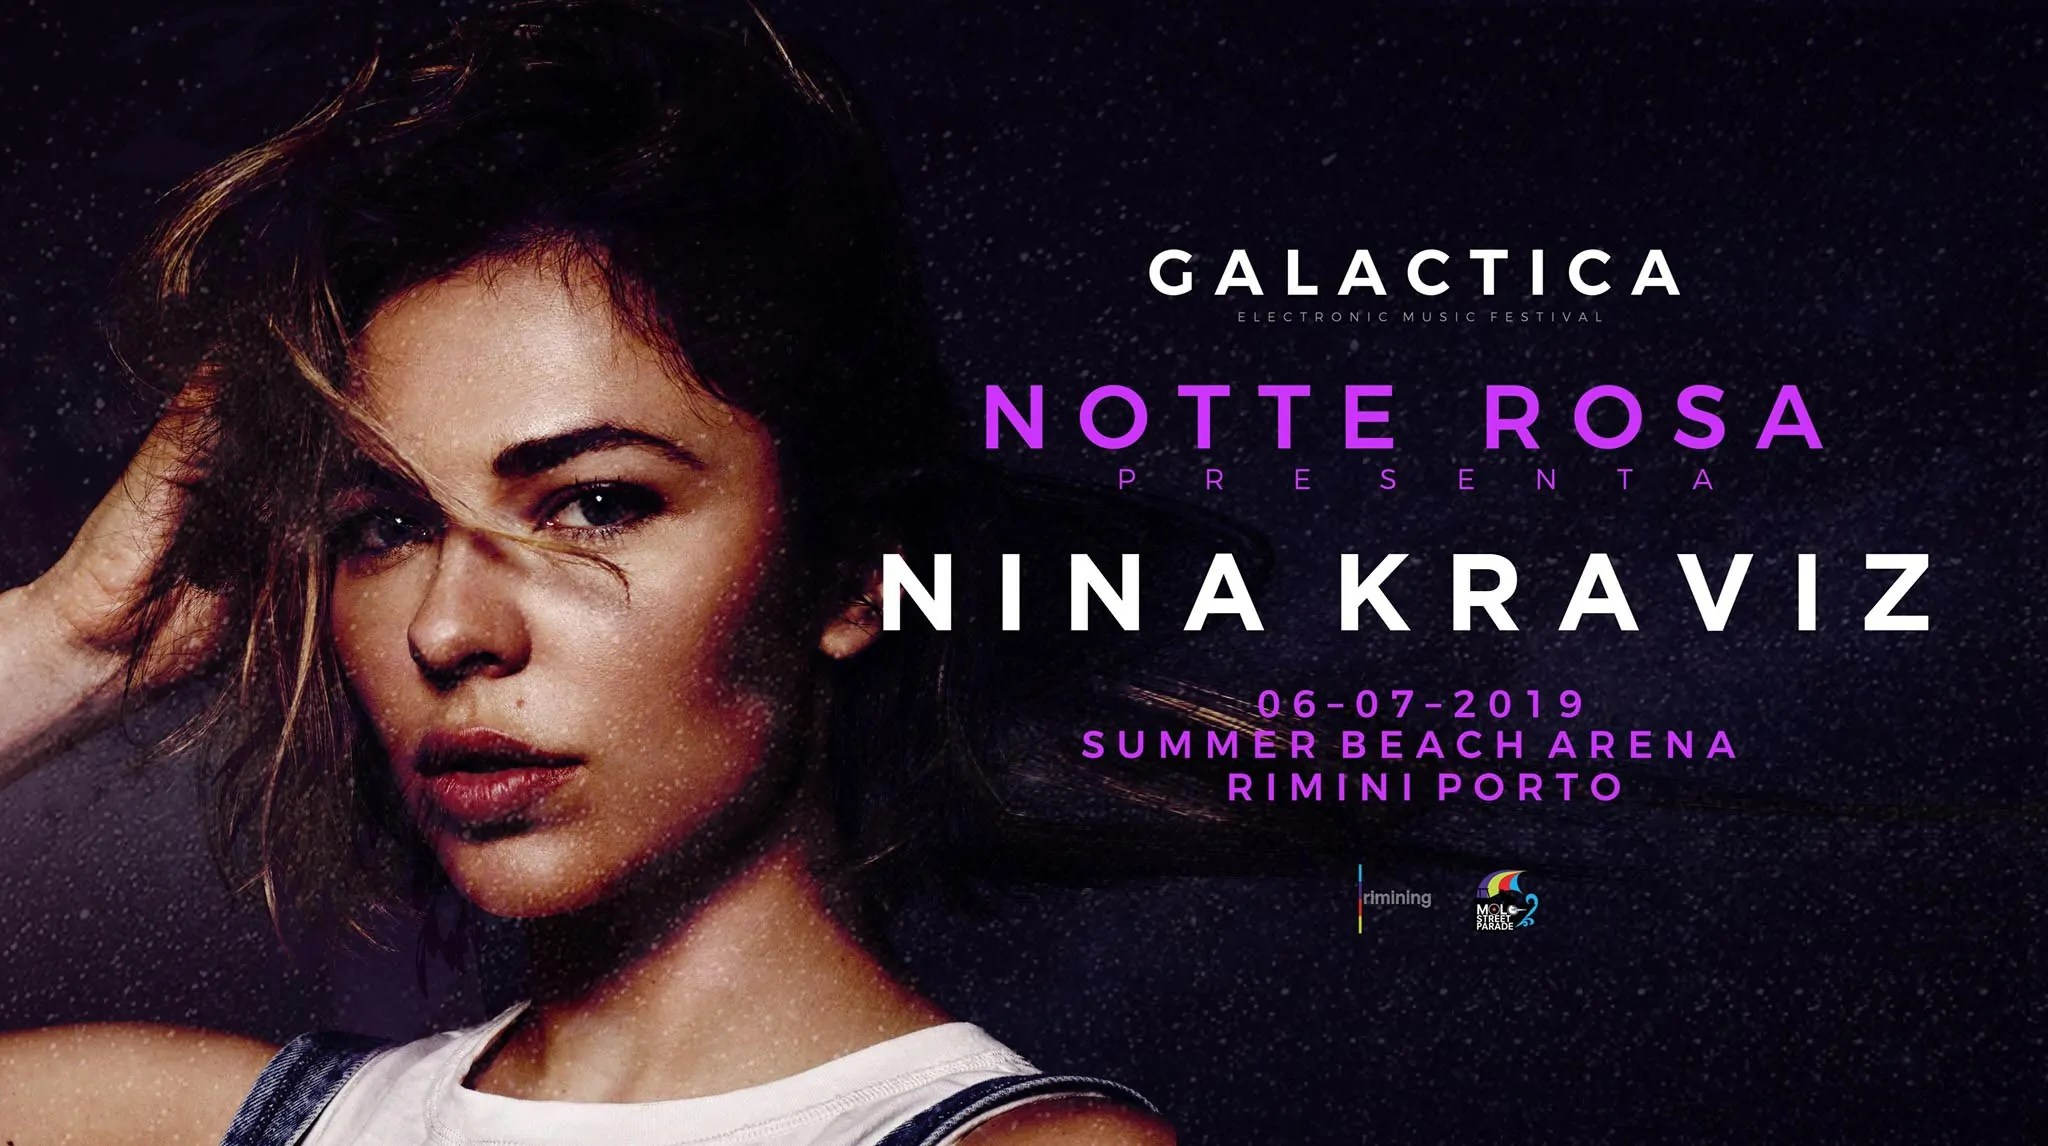 Nina Kraviz Rimini Galactica Summer Beach Arena 06 Luglio 2019 Notte Rosa Ticket/Biglietti/Prevendite 18APP Tavoli Pacchetti hotel Prevendite